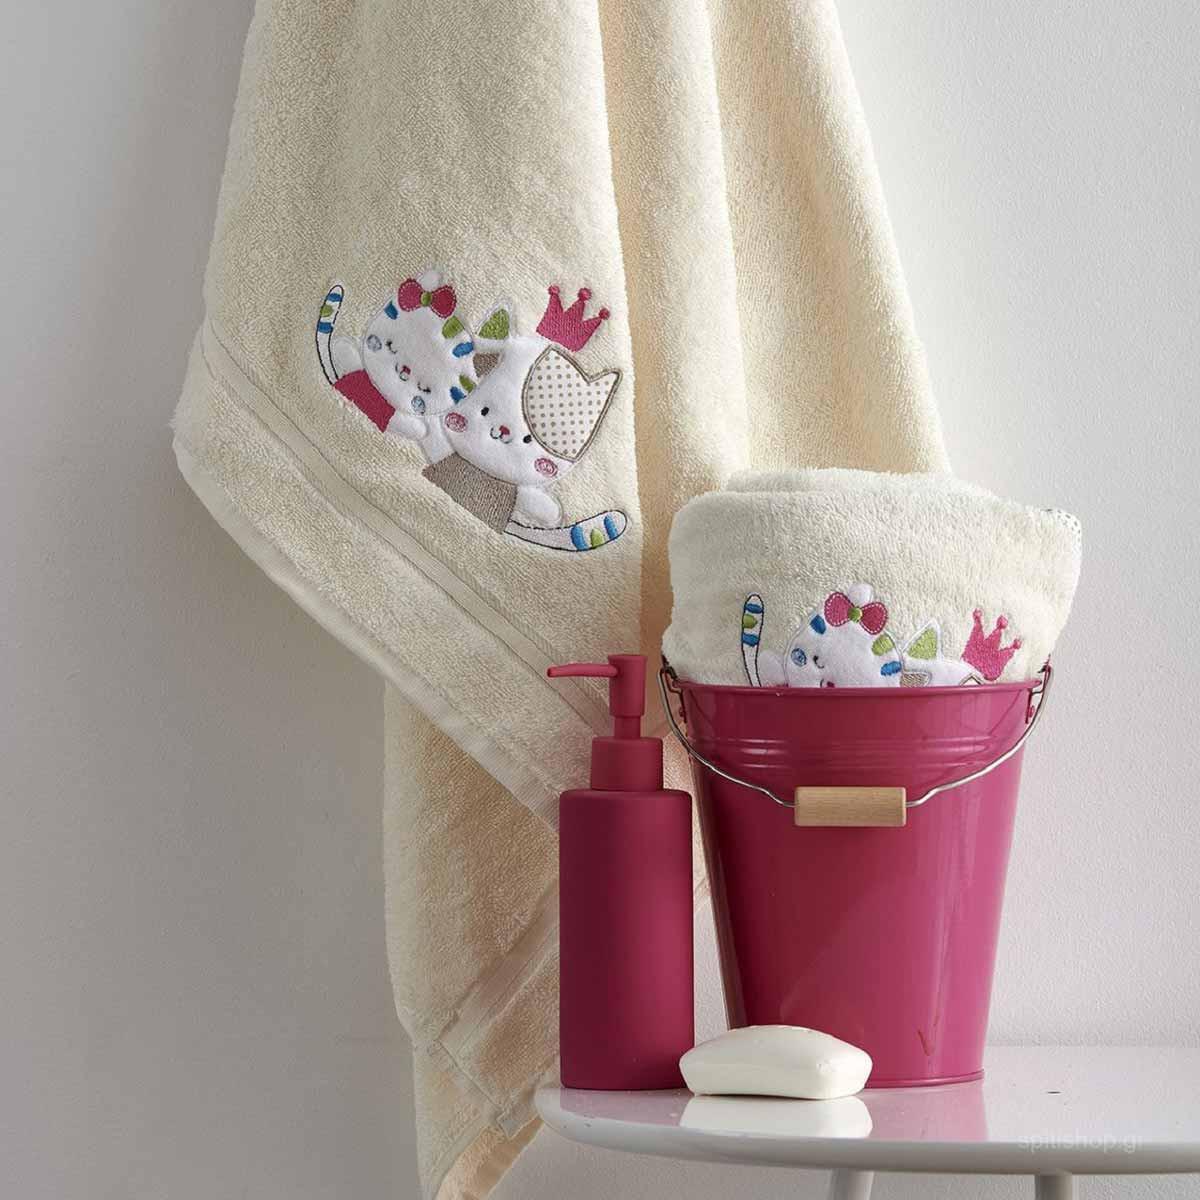 2fd7b8678c0 Βρεφικές Πετσέτες (Σετ 2τμχ) Sb Home Baby Gattino Cream 113389